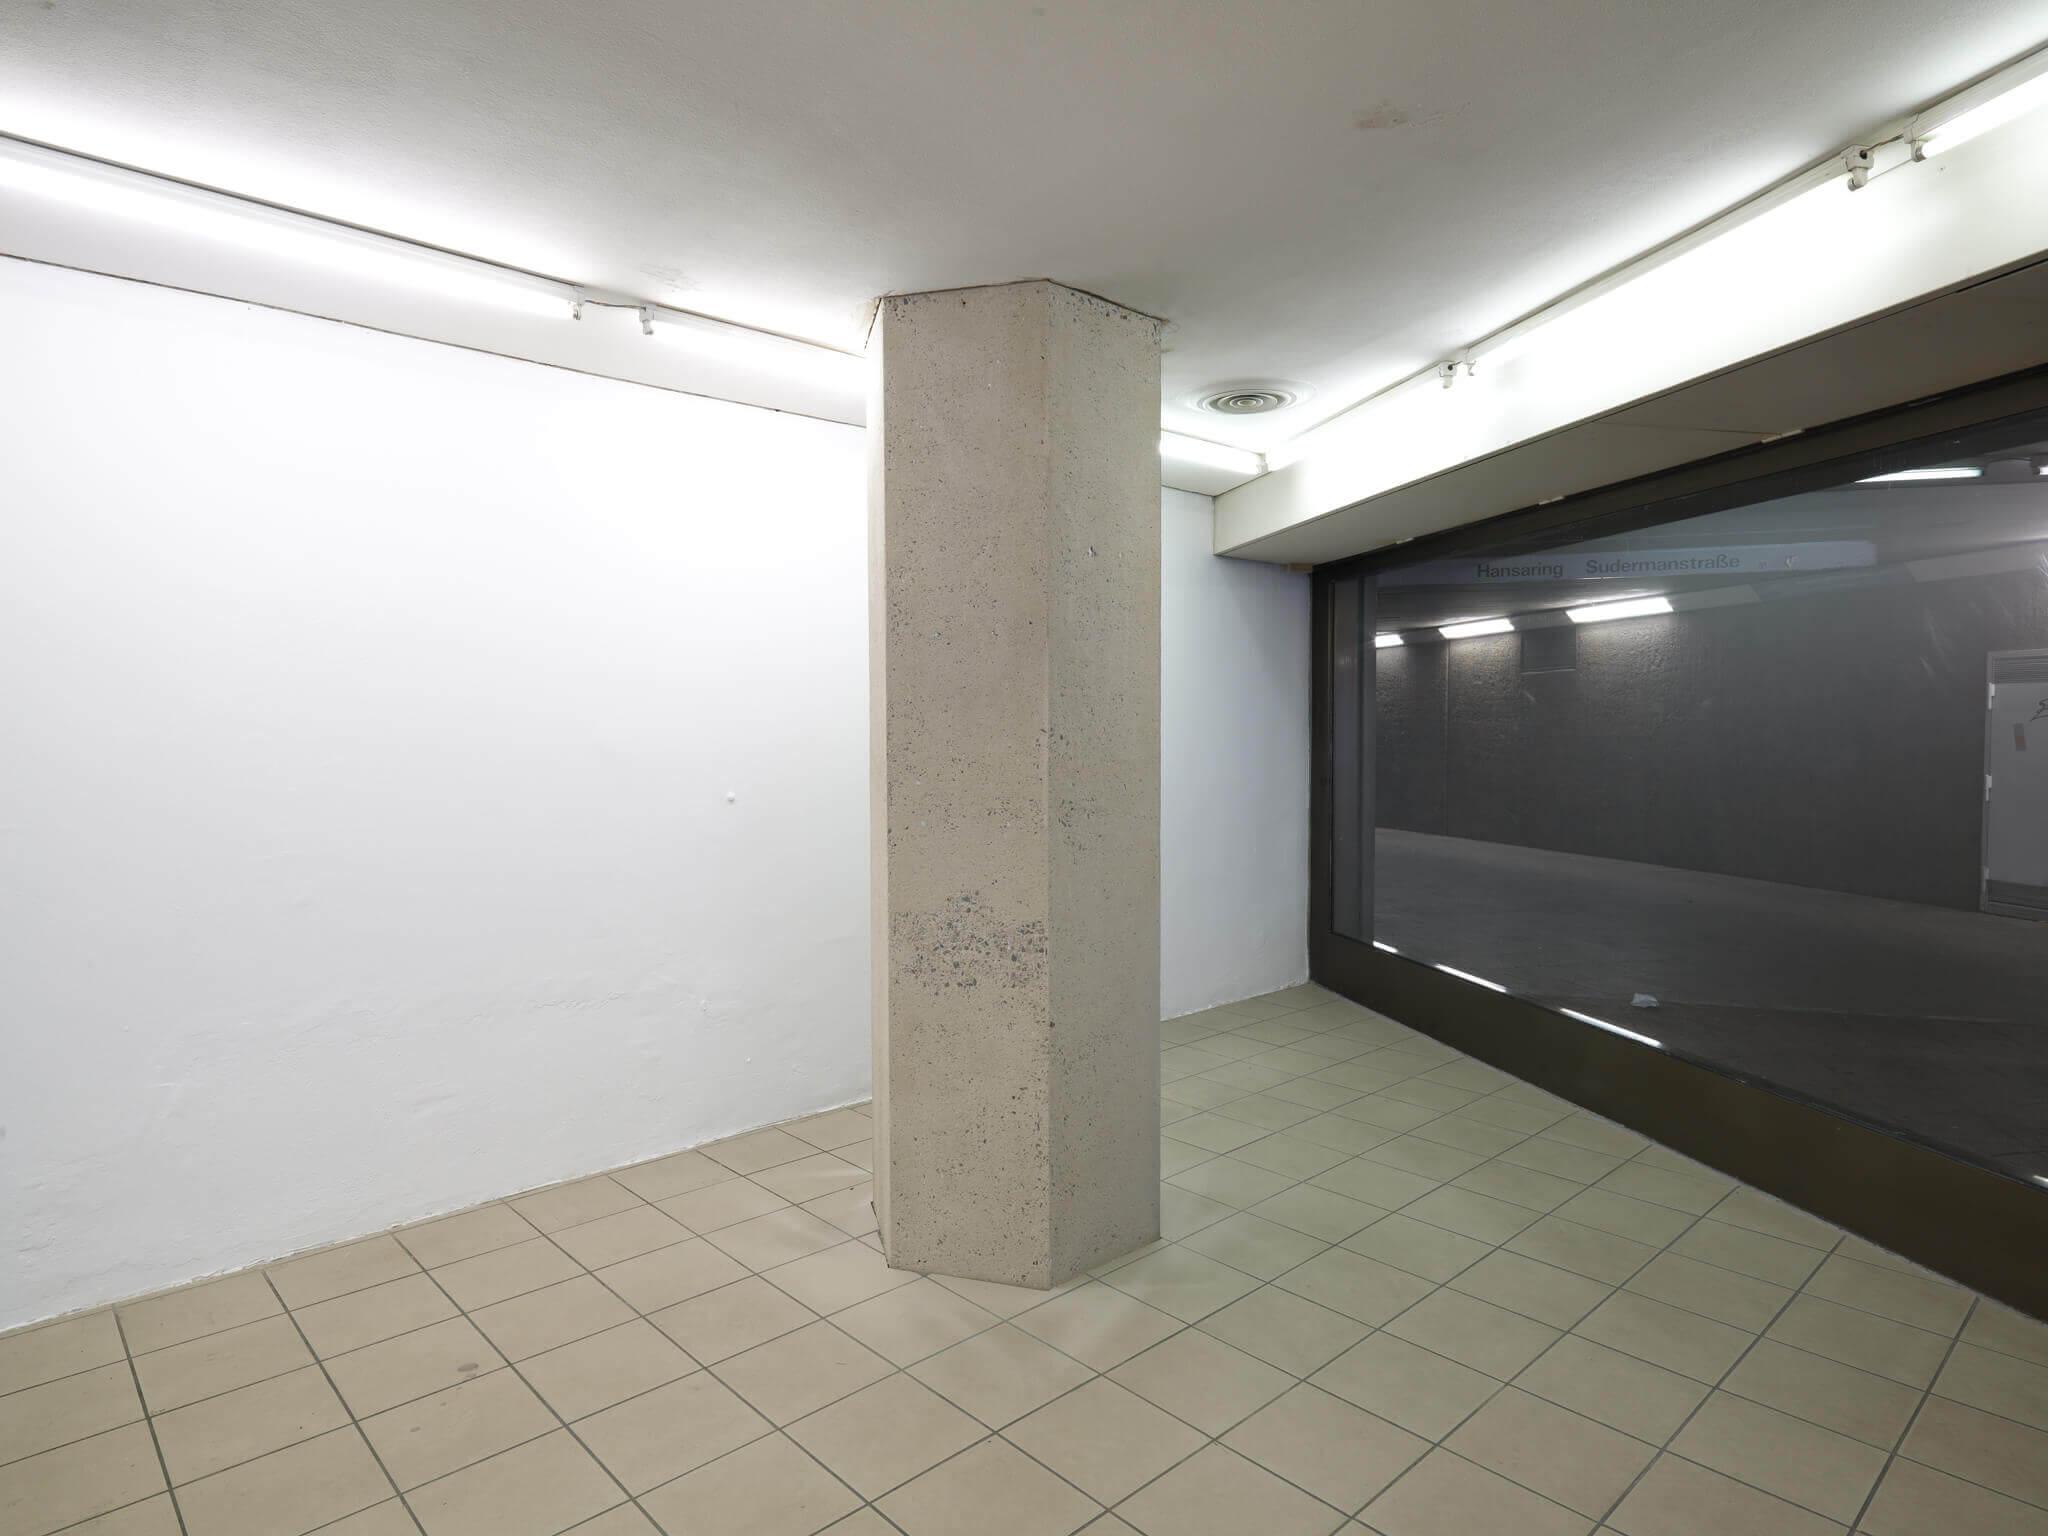 20140304_Frauke Dannert_Installation_0005 Kopie